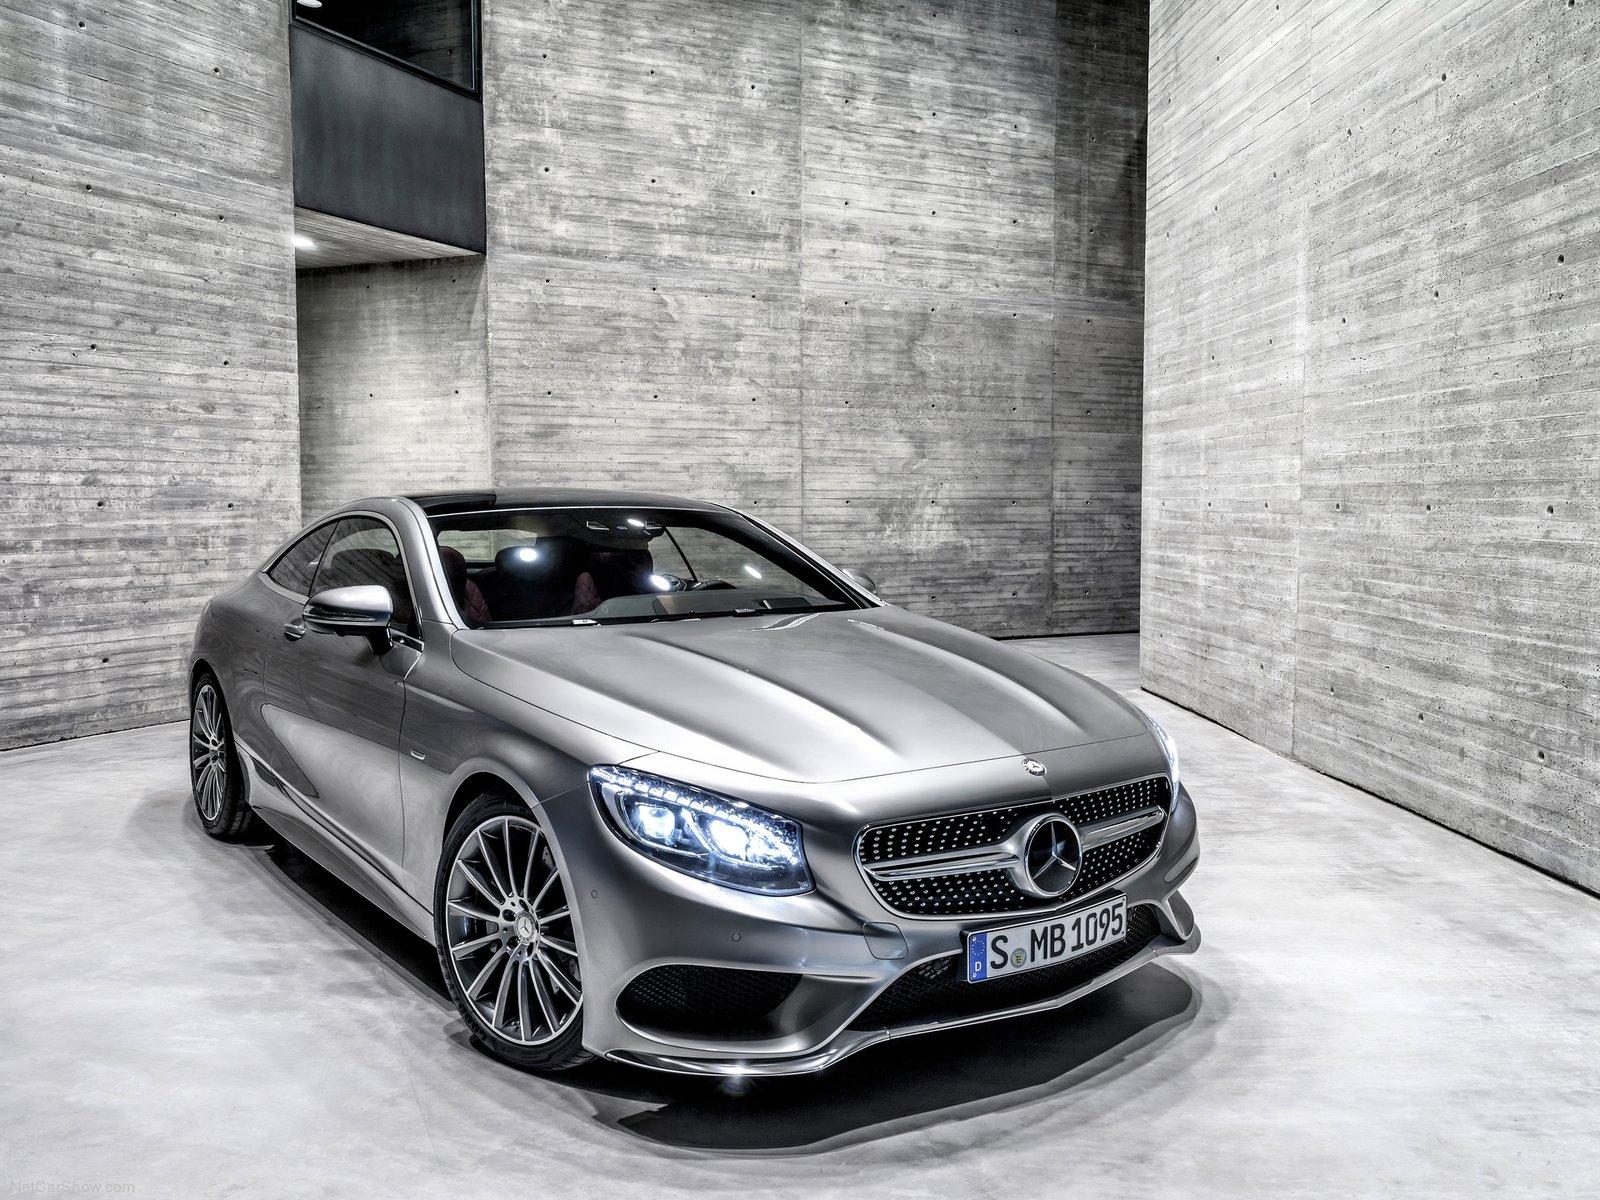 luxusnym autom roka 2015 je Mercedes S coupe